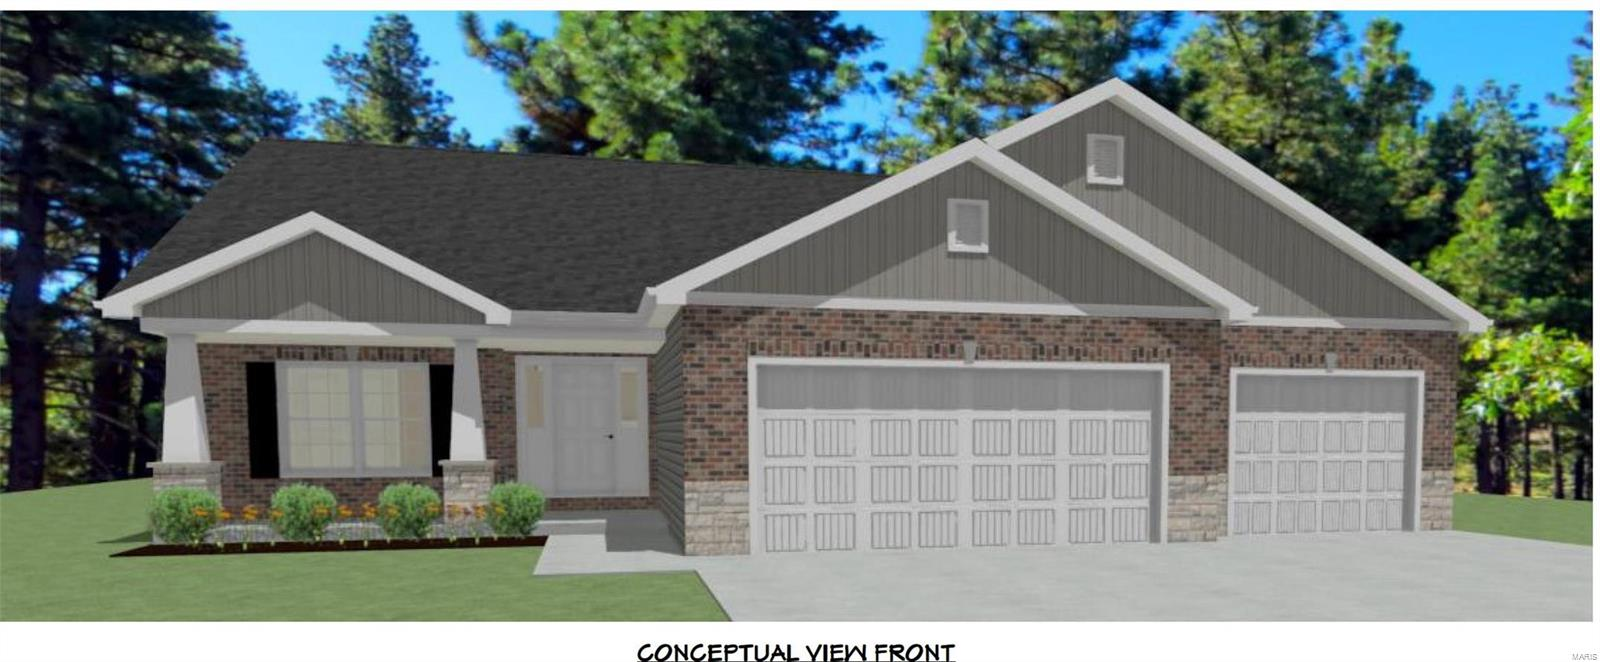 422 Grand Reserve Property Photo - Shiloh, IL real estate listing